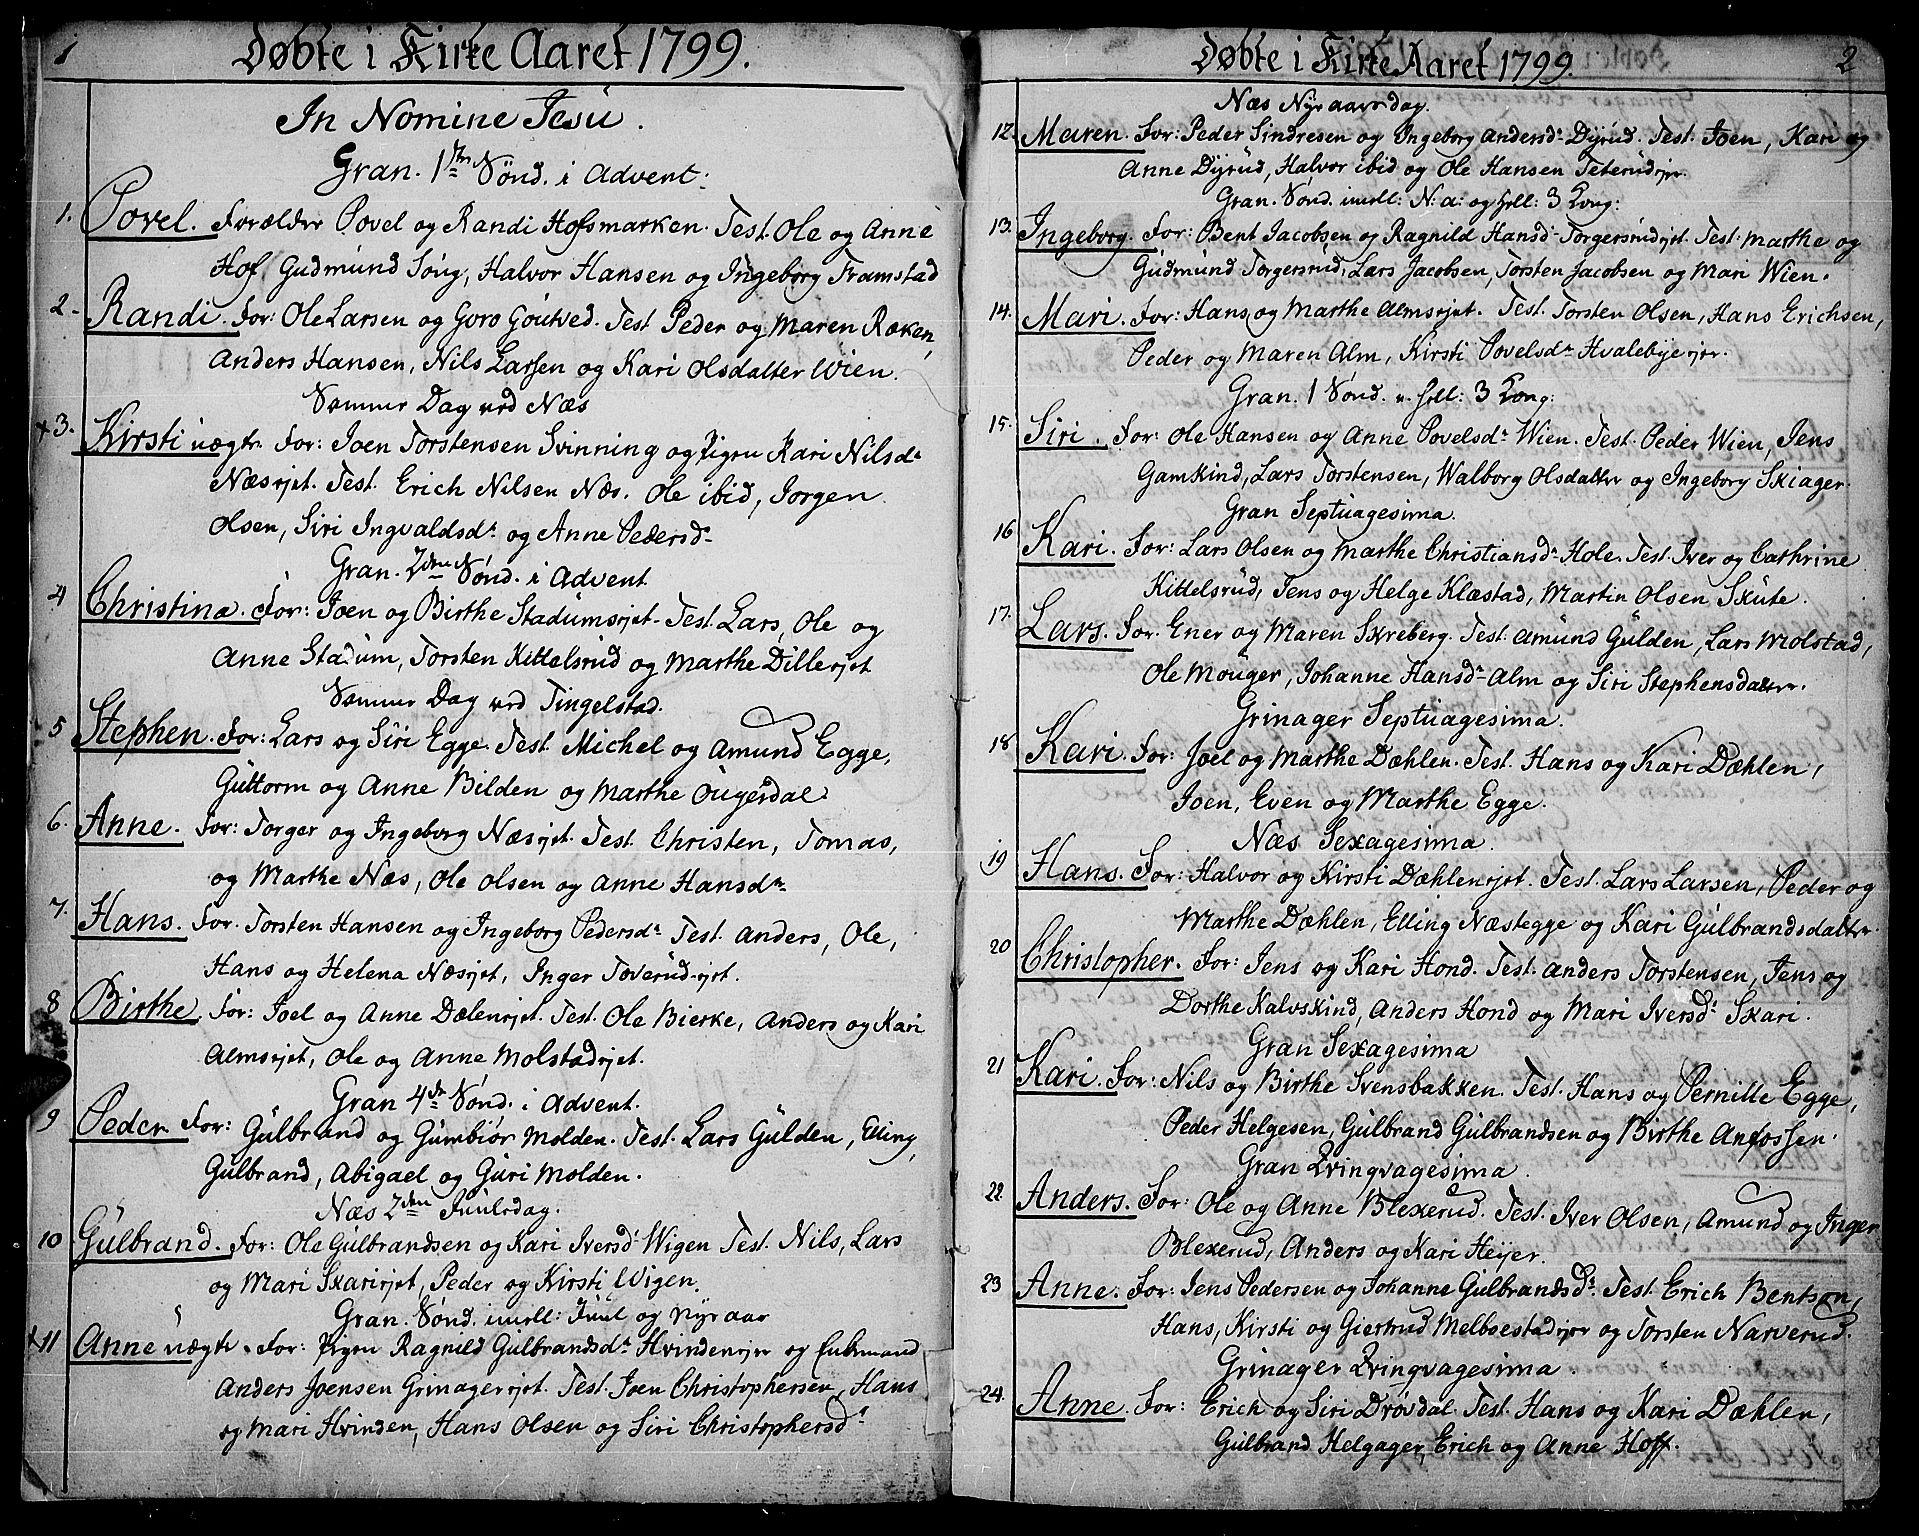 SAH, Gran prestekontor, Ministerialbok nr. 8, 1798-1811, s. 1-2